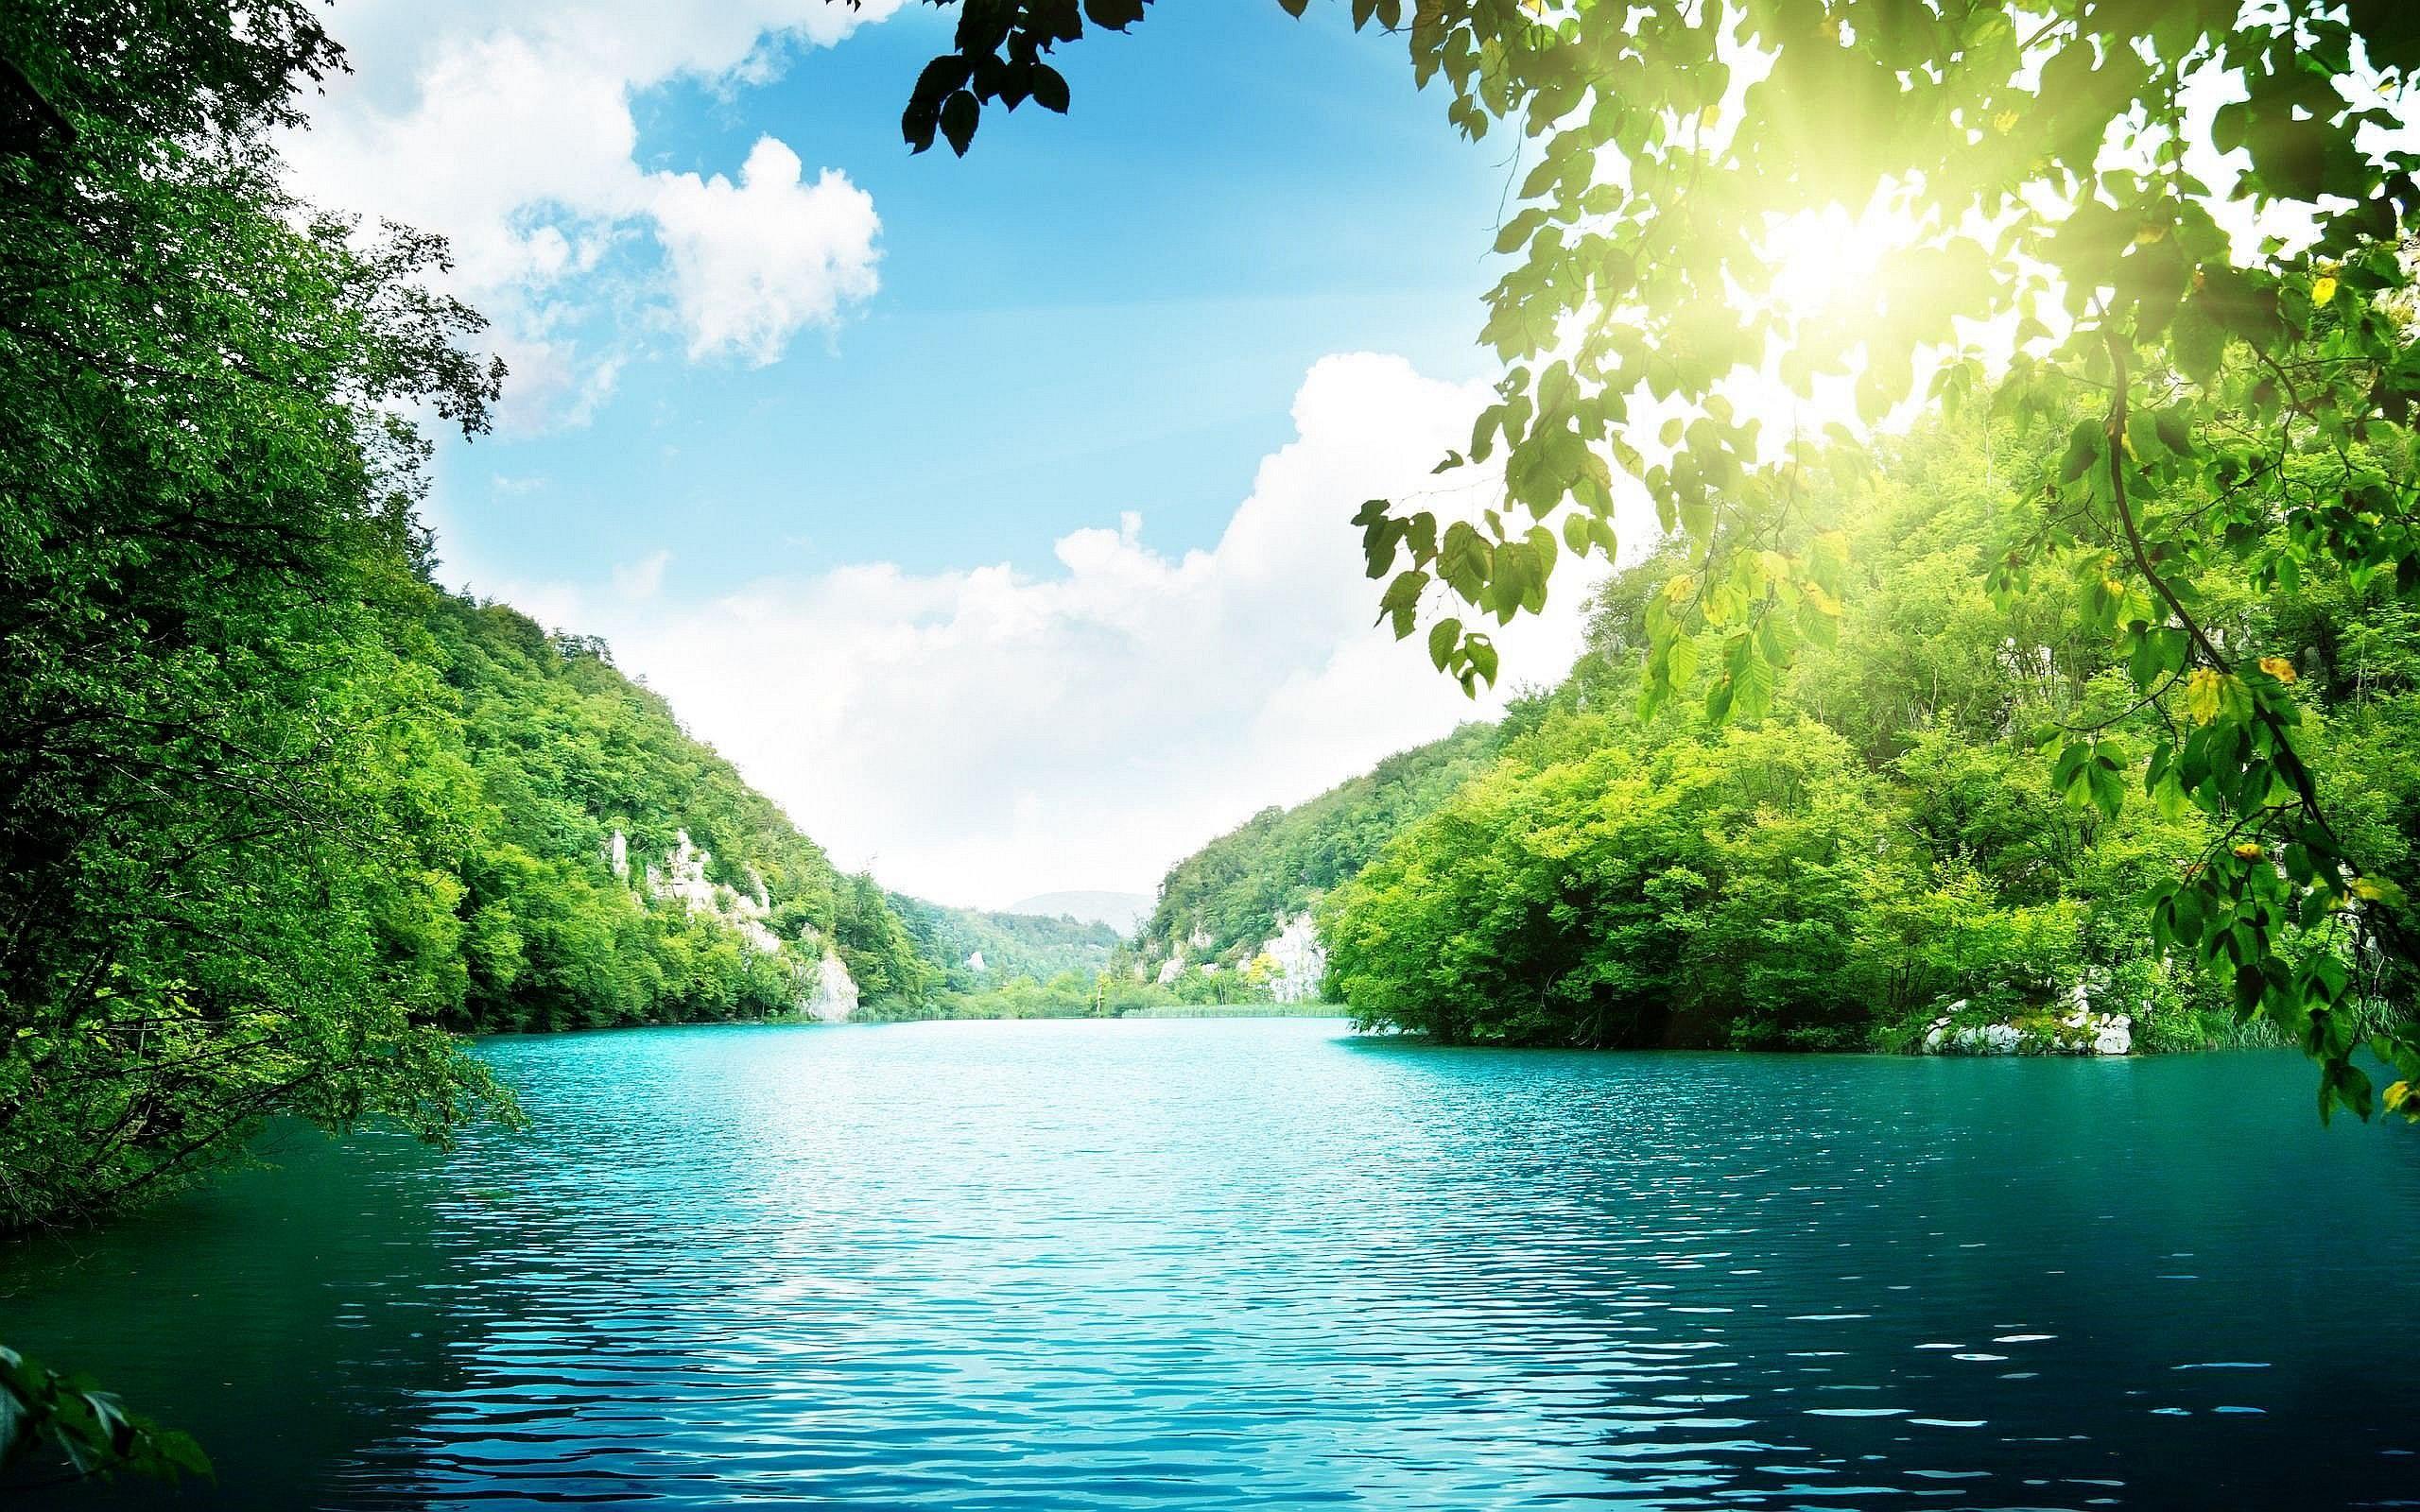 Water Desktop Background (69+ images)